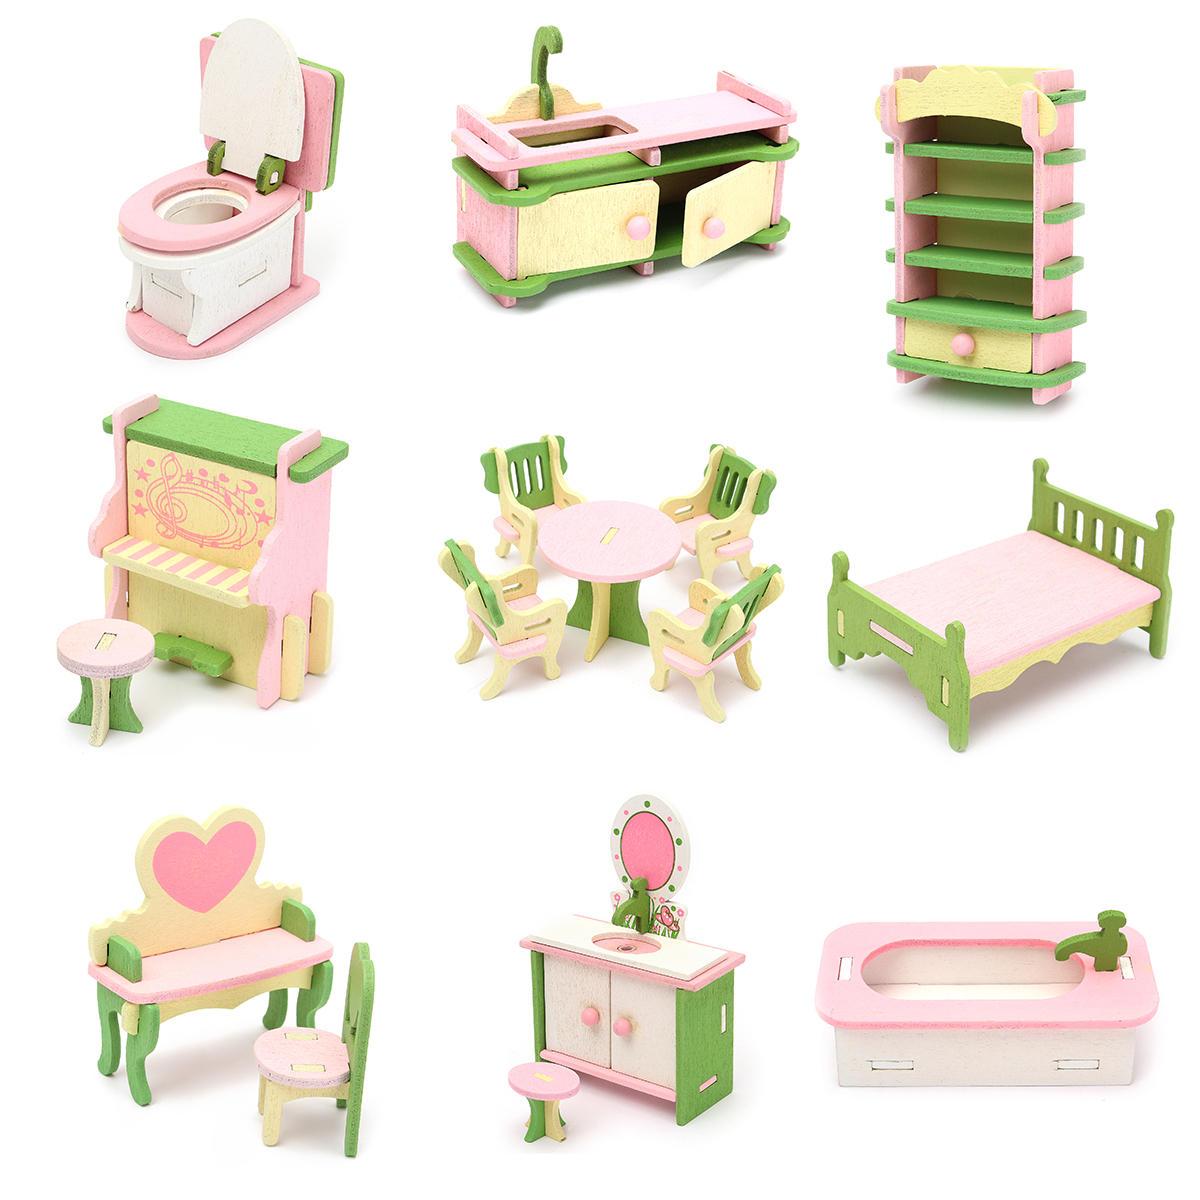 Houten meubilair Set Doll House Miniatuur Kamer Accessoires Kids Pretend Speel Toy Gift Decor